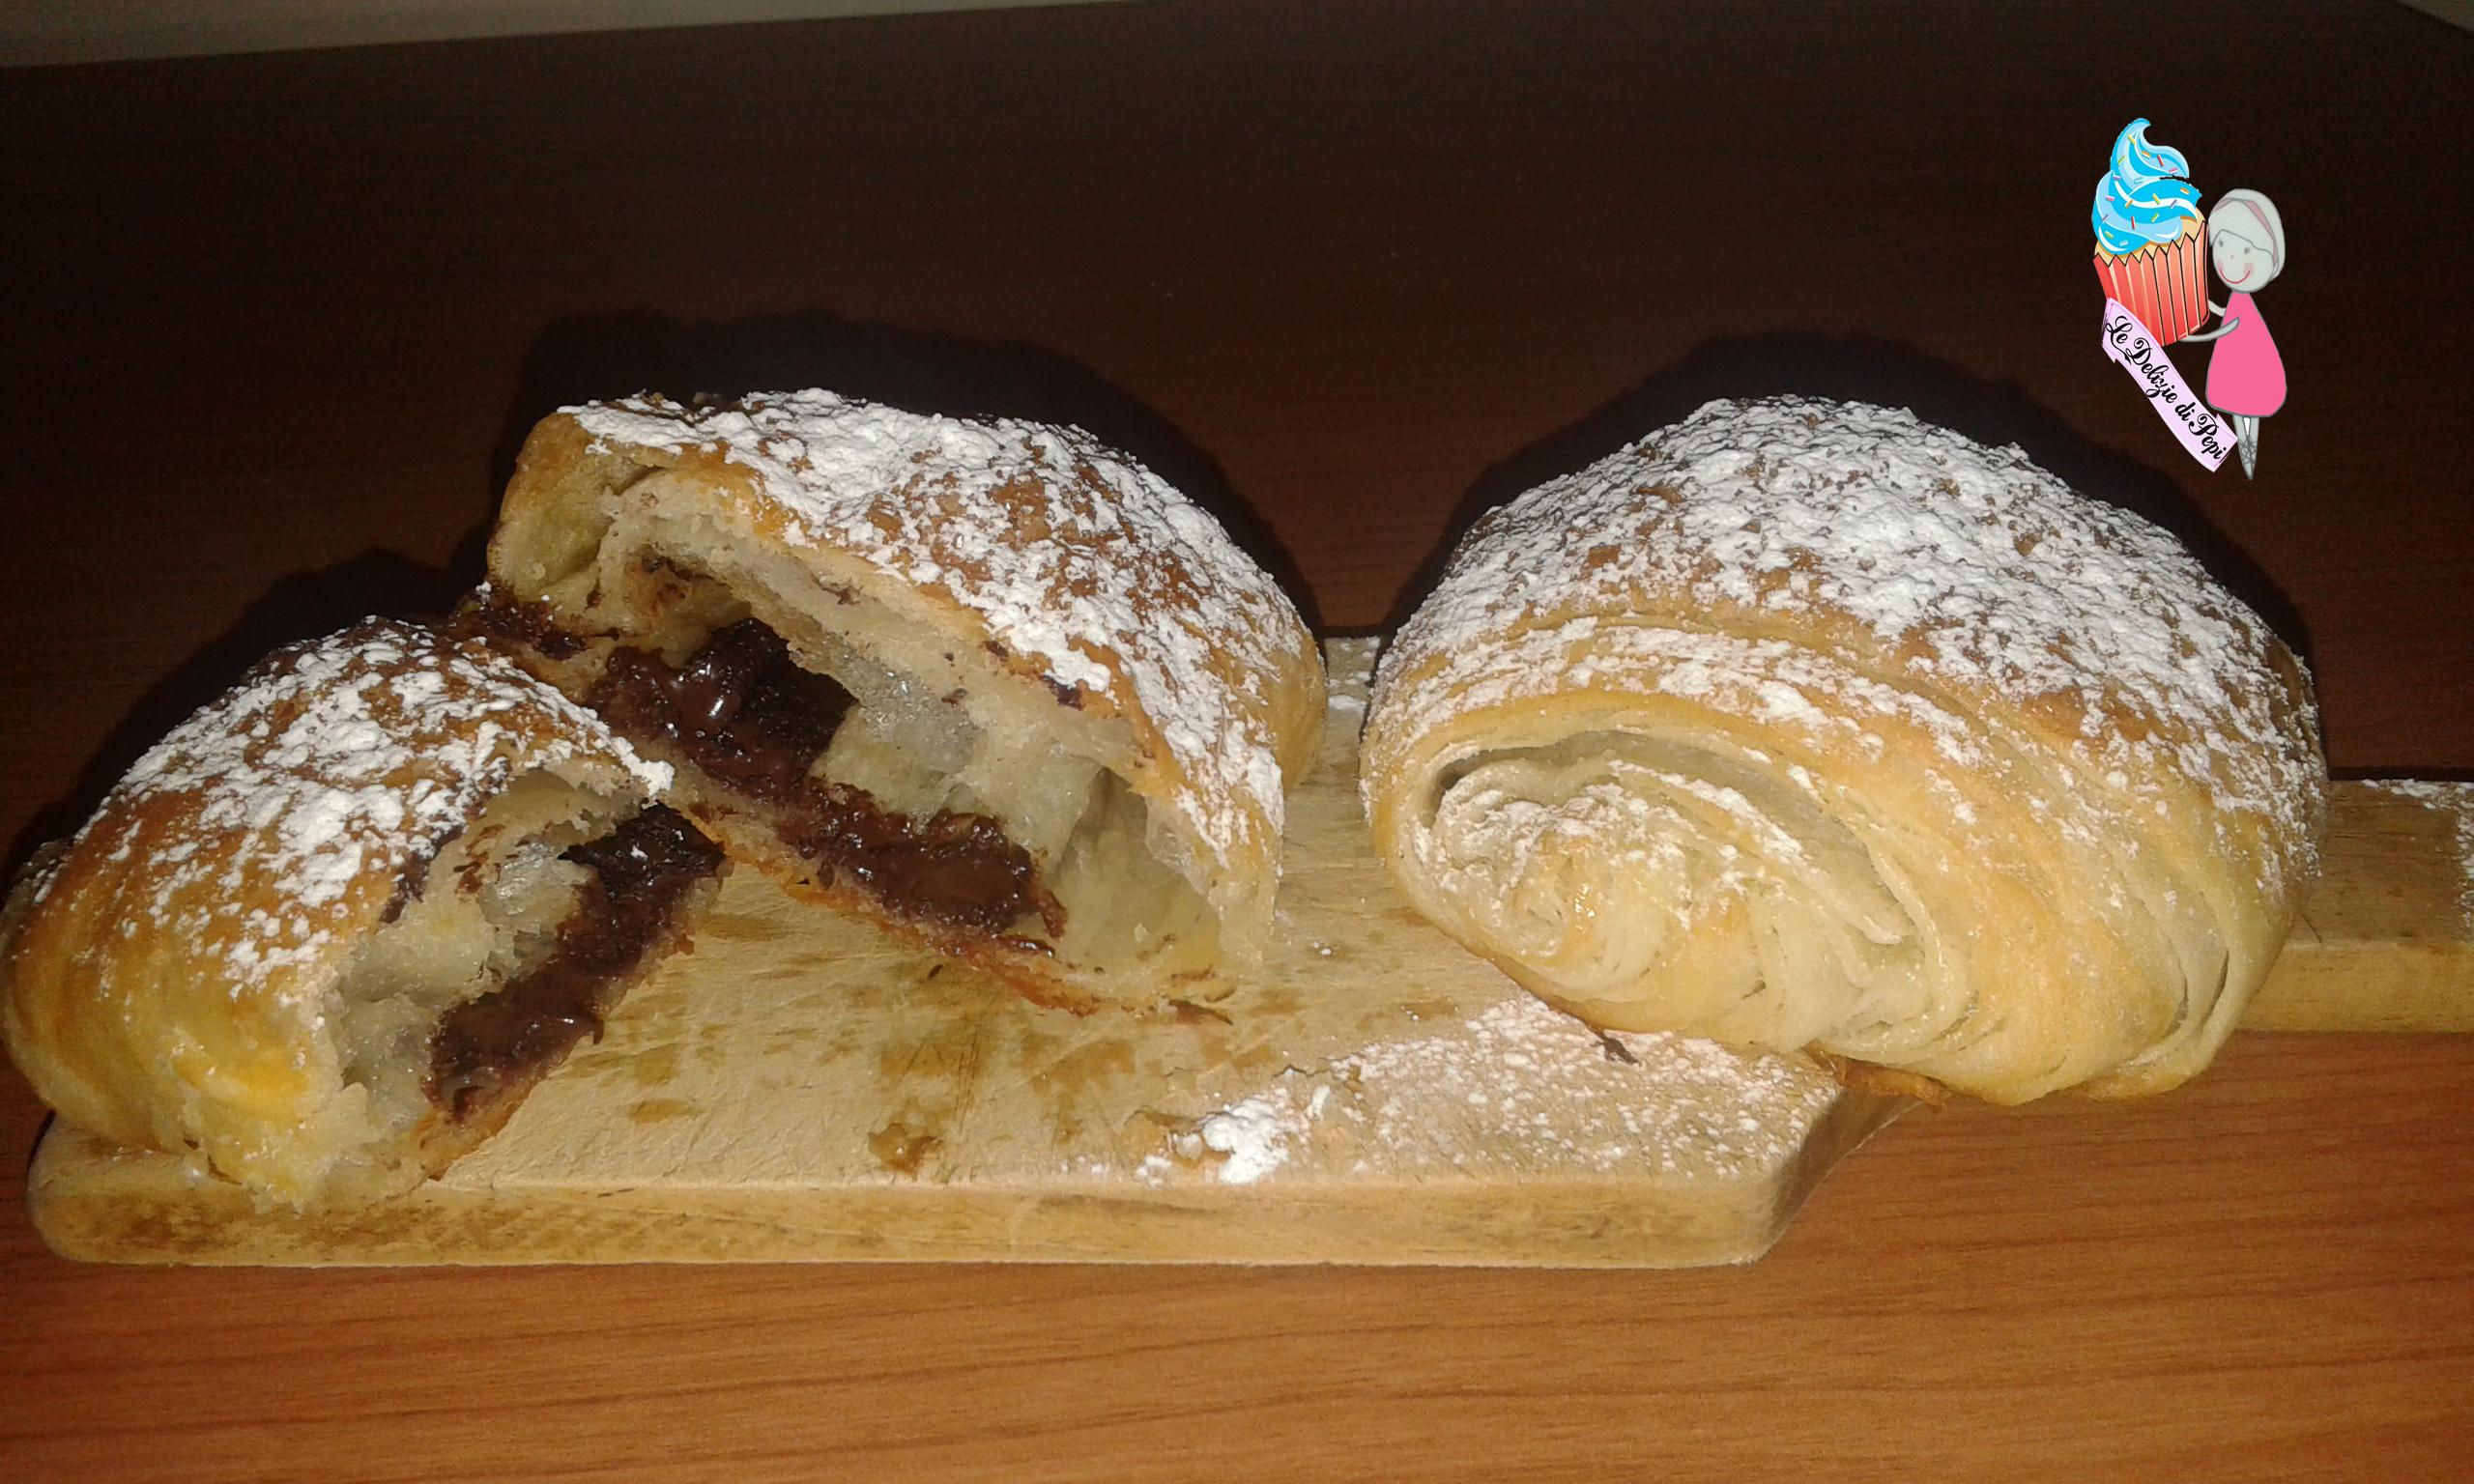 Saccottini o pain au chocolat